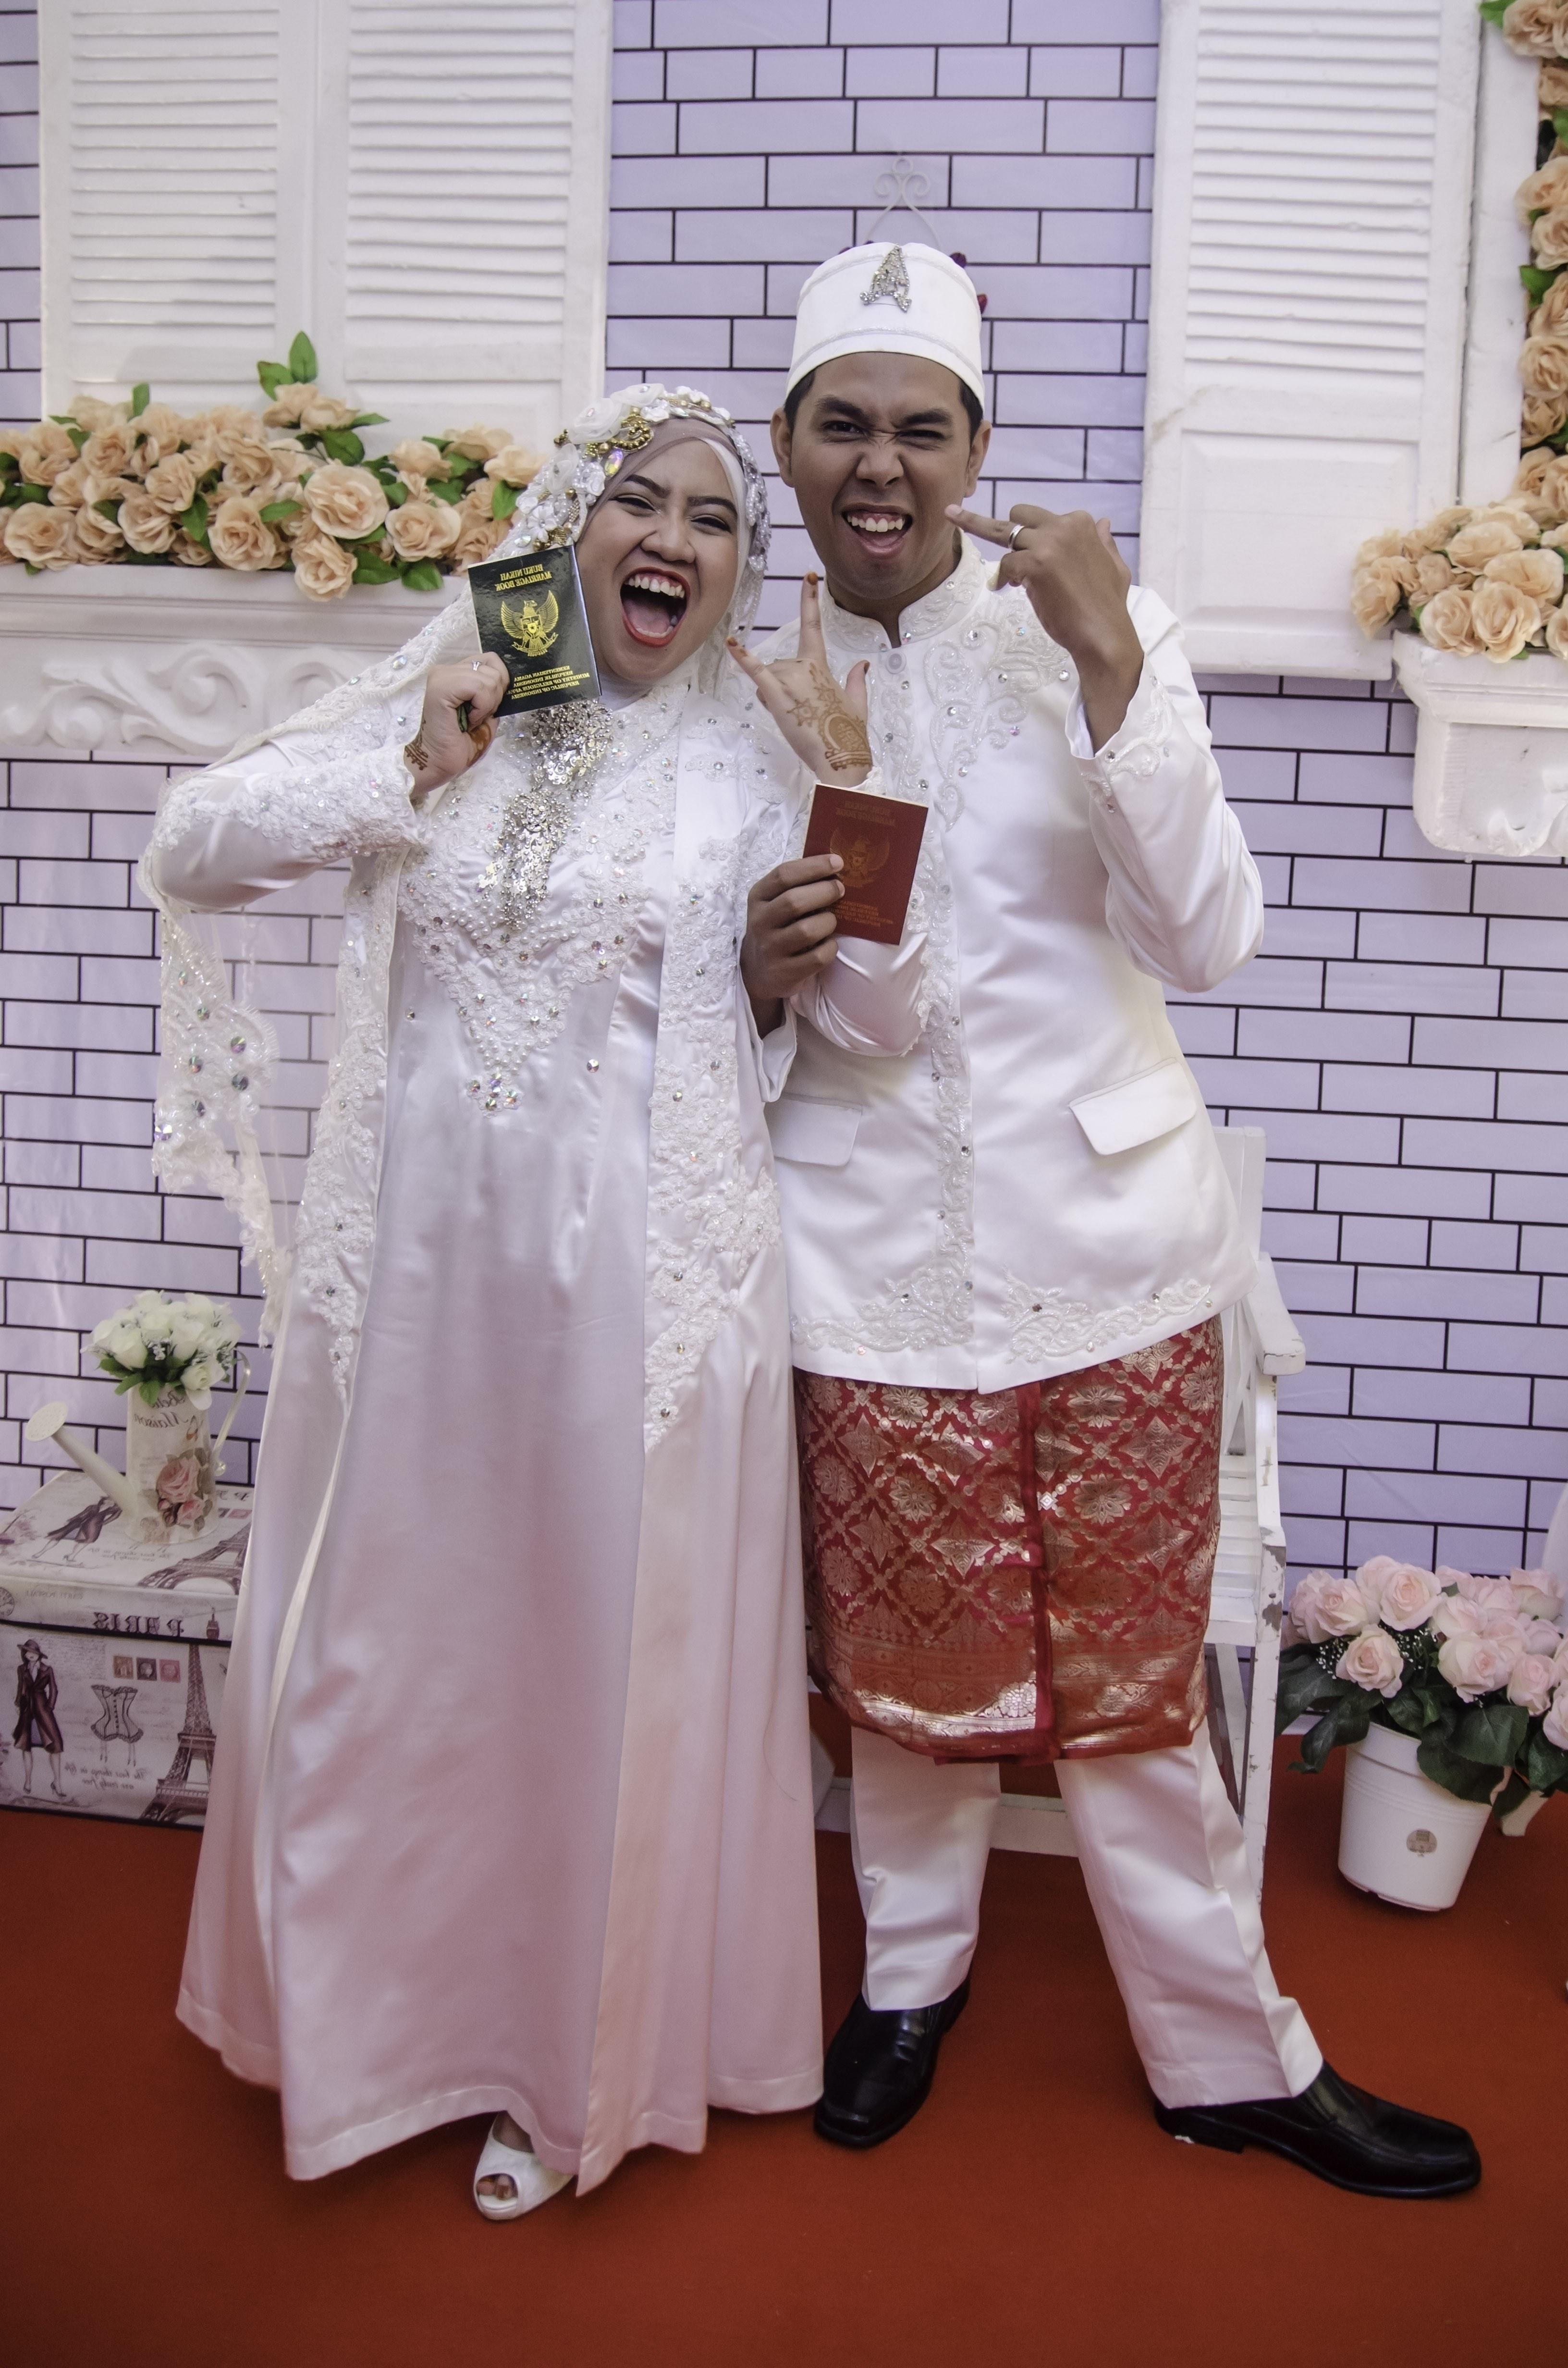 Inspirasi Gaun Pengantin Adat Sunda Muslim 3ldq Gaun Pengantin Muslim Elegan Baju Nikah Jawa Muslim Nhs